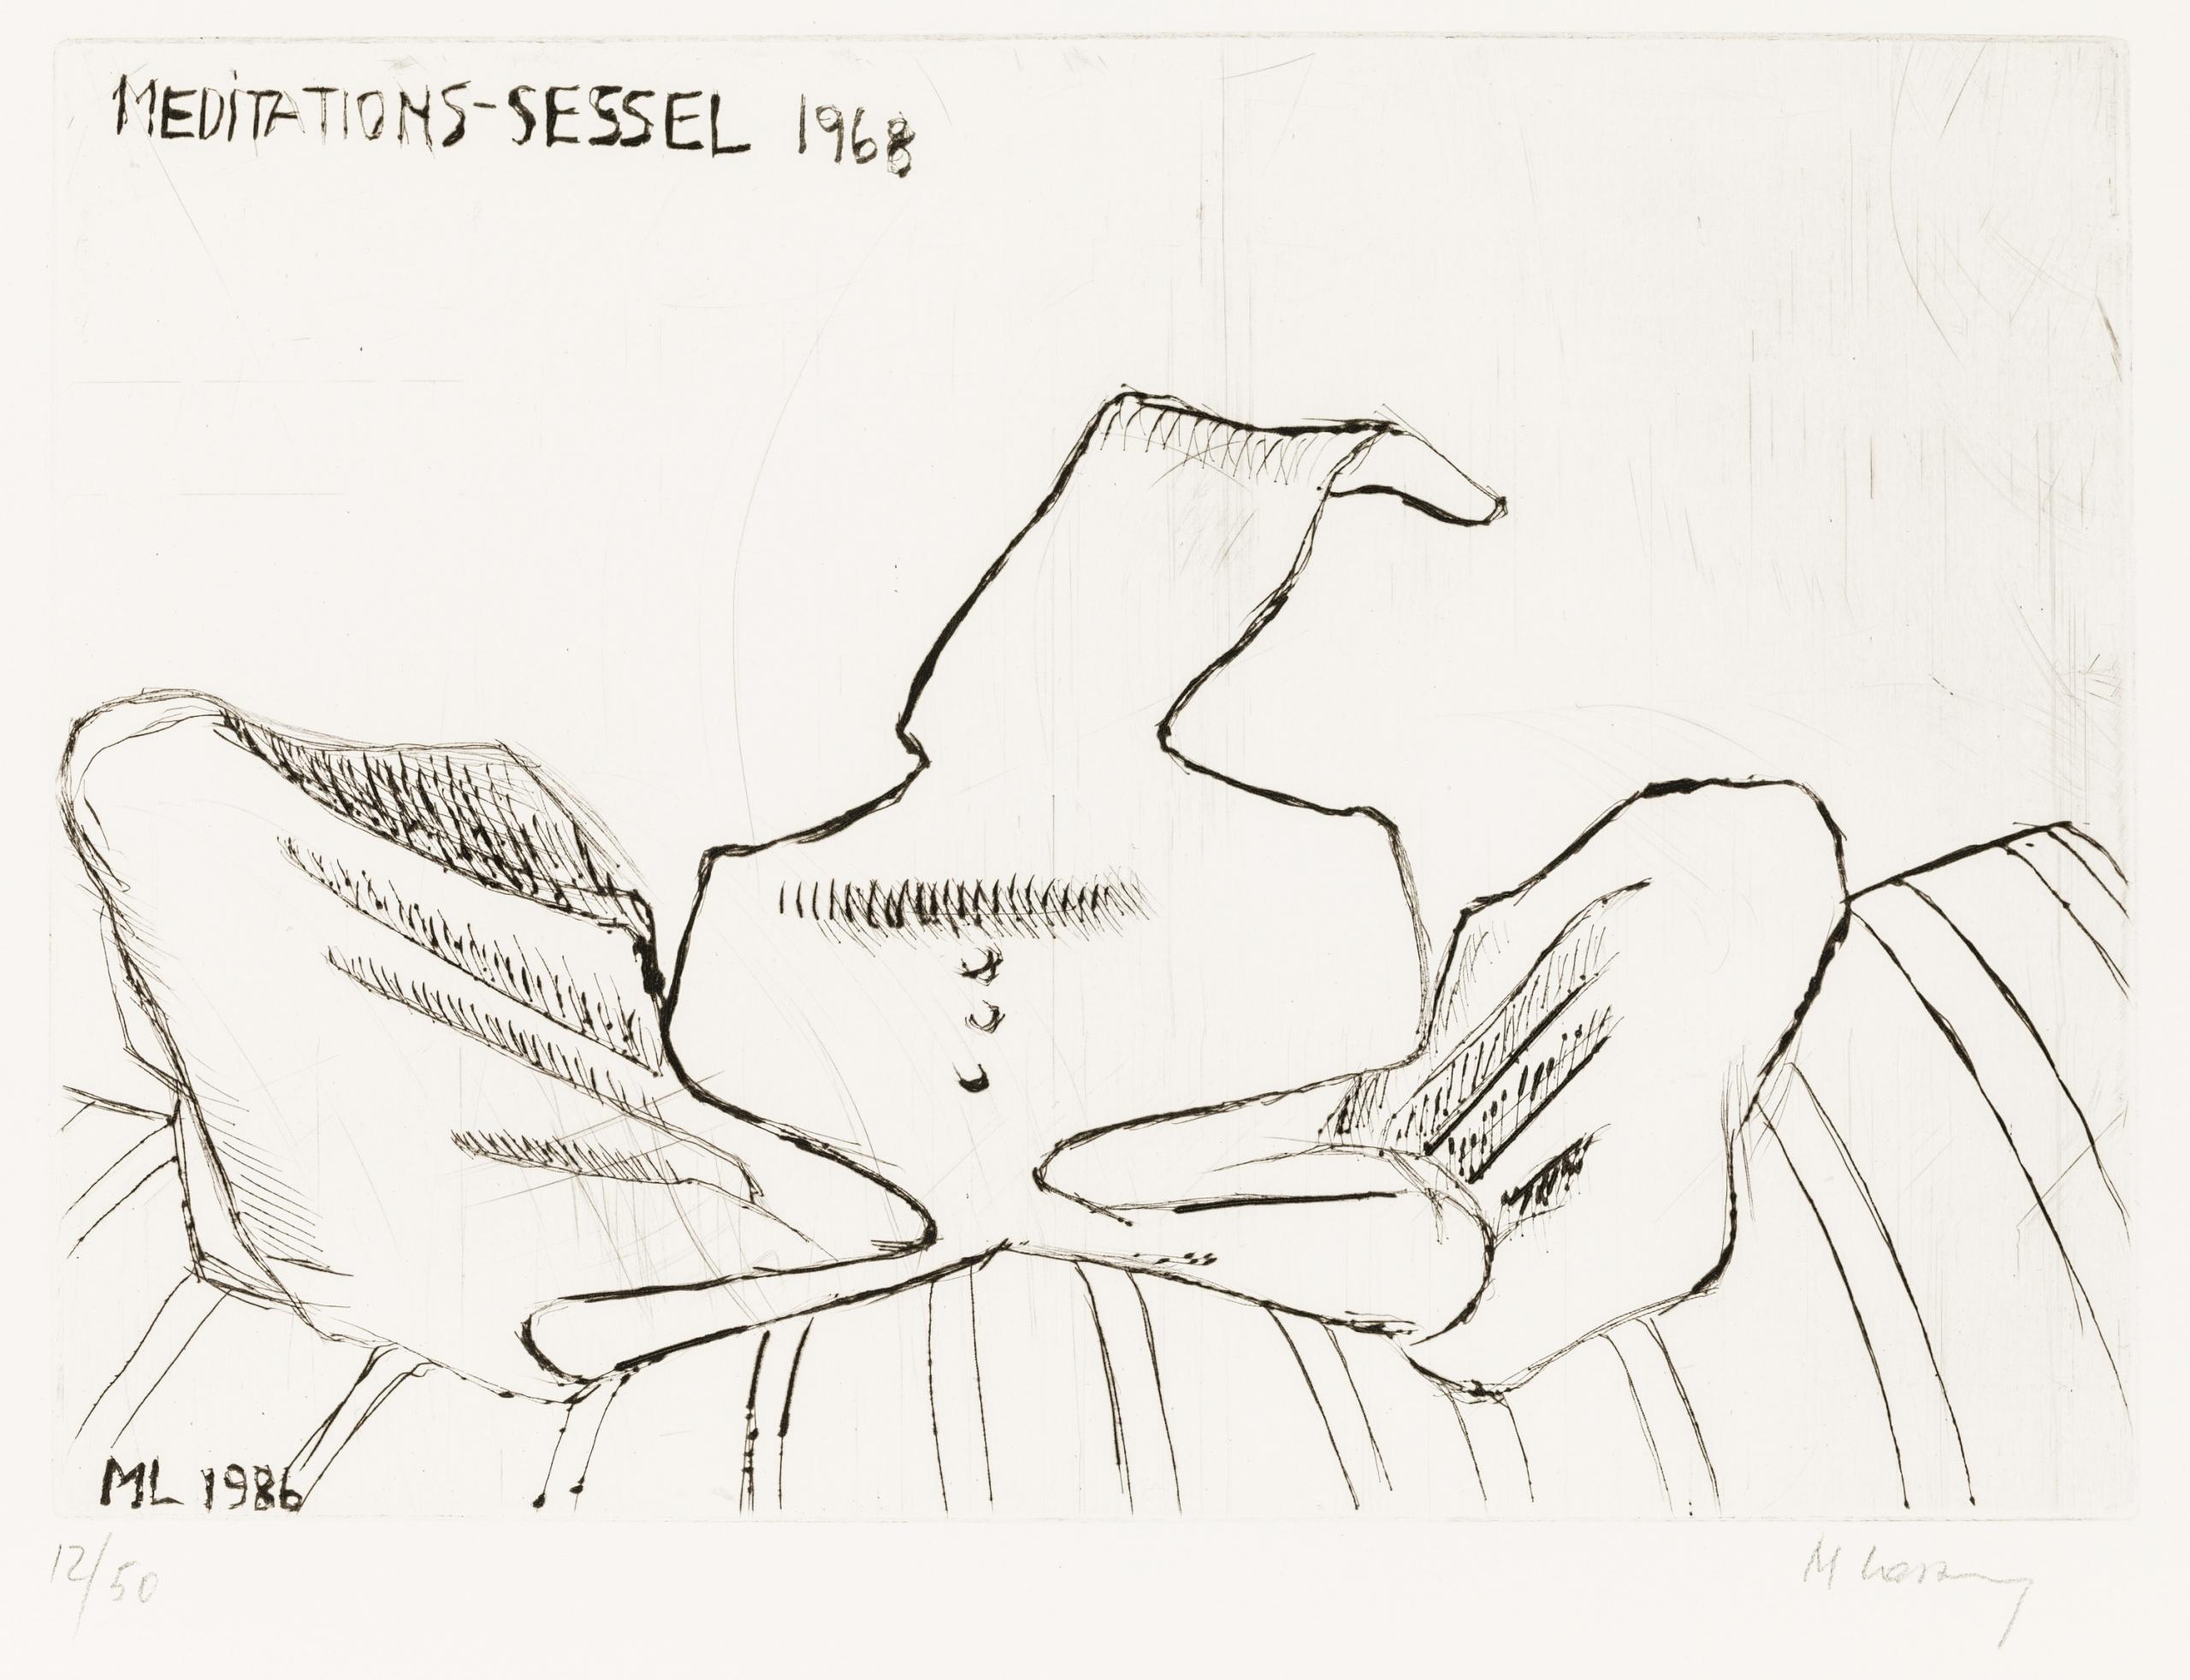 Maria Lassnig, MEDITATIONS-SESSEL 1968